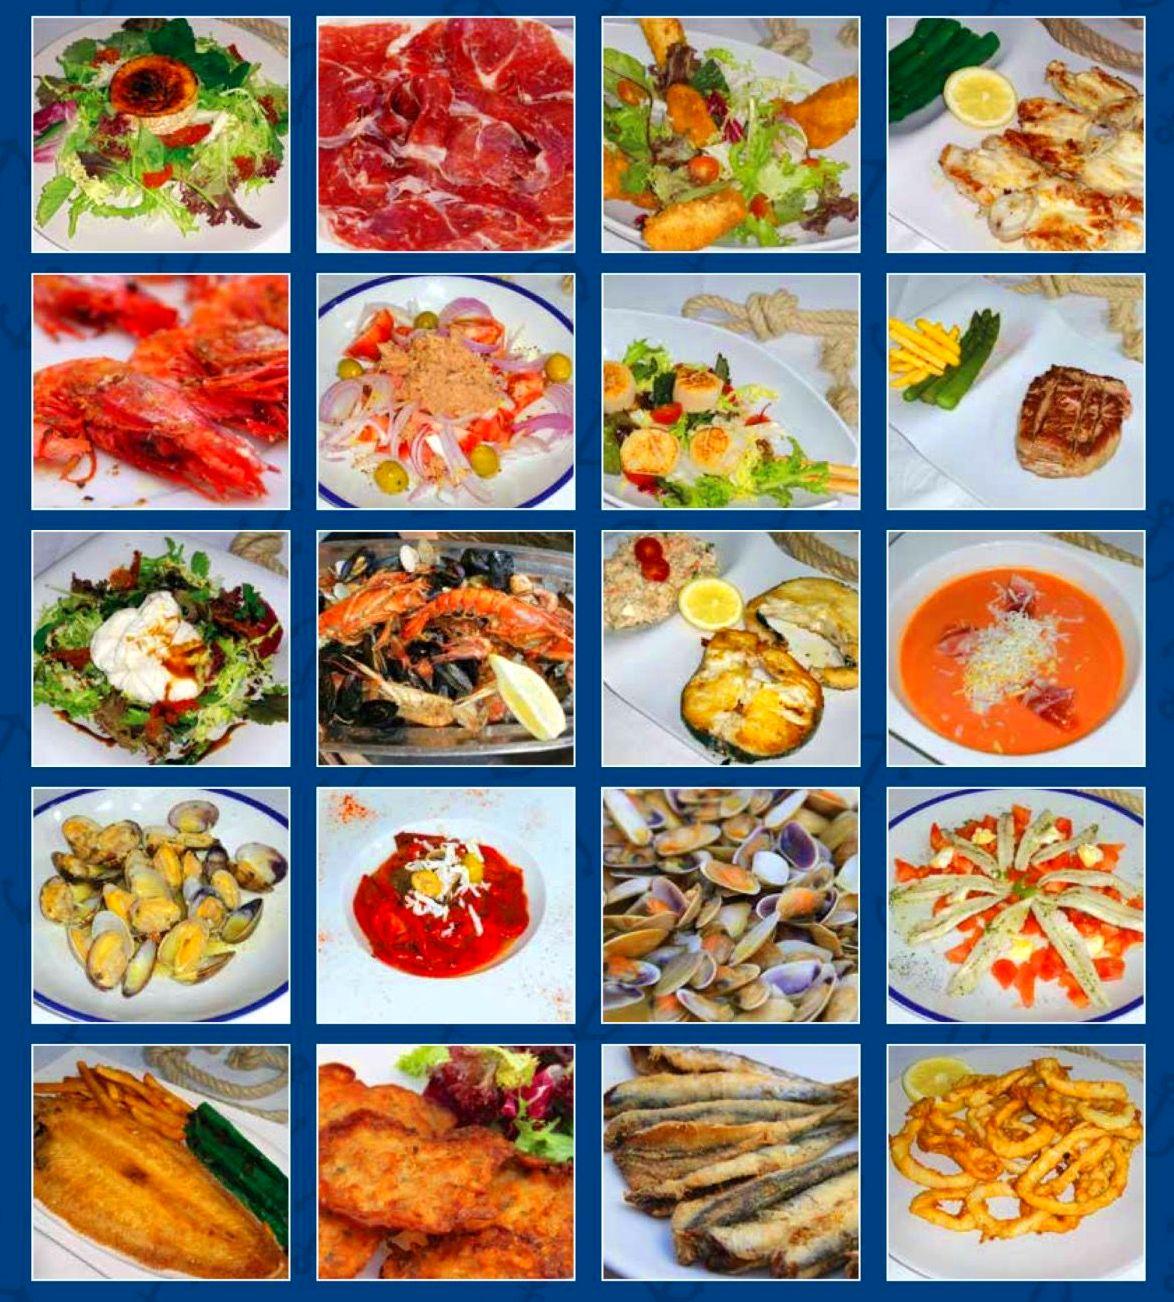 Foto 36 de Restaurante en Platja d'Aro | Restaurant & Lounge M&B